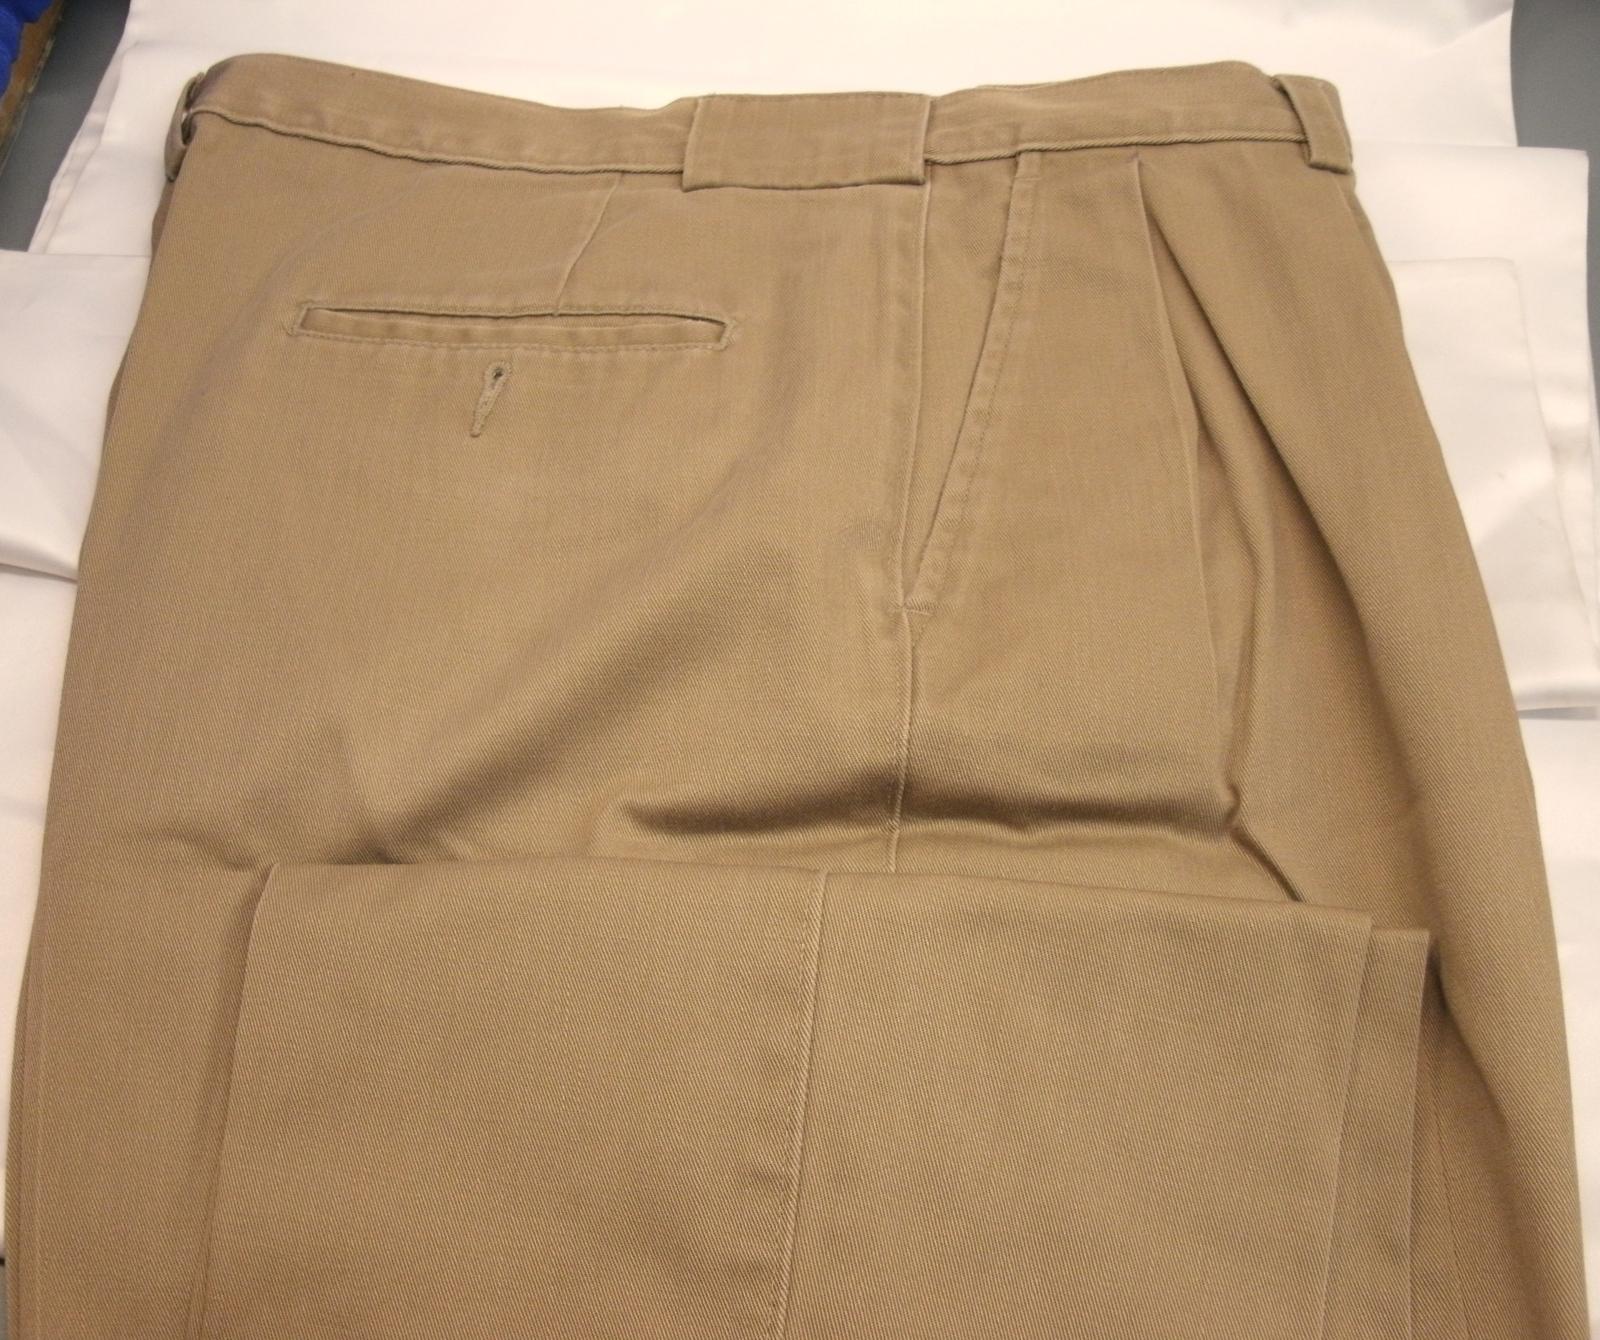 TOMMY BAHAMA Men/'s Cotton Tencel Blend Athletic Walking Shorts ~ NWOT